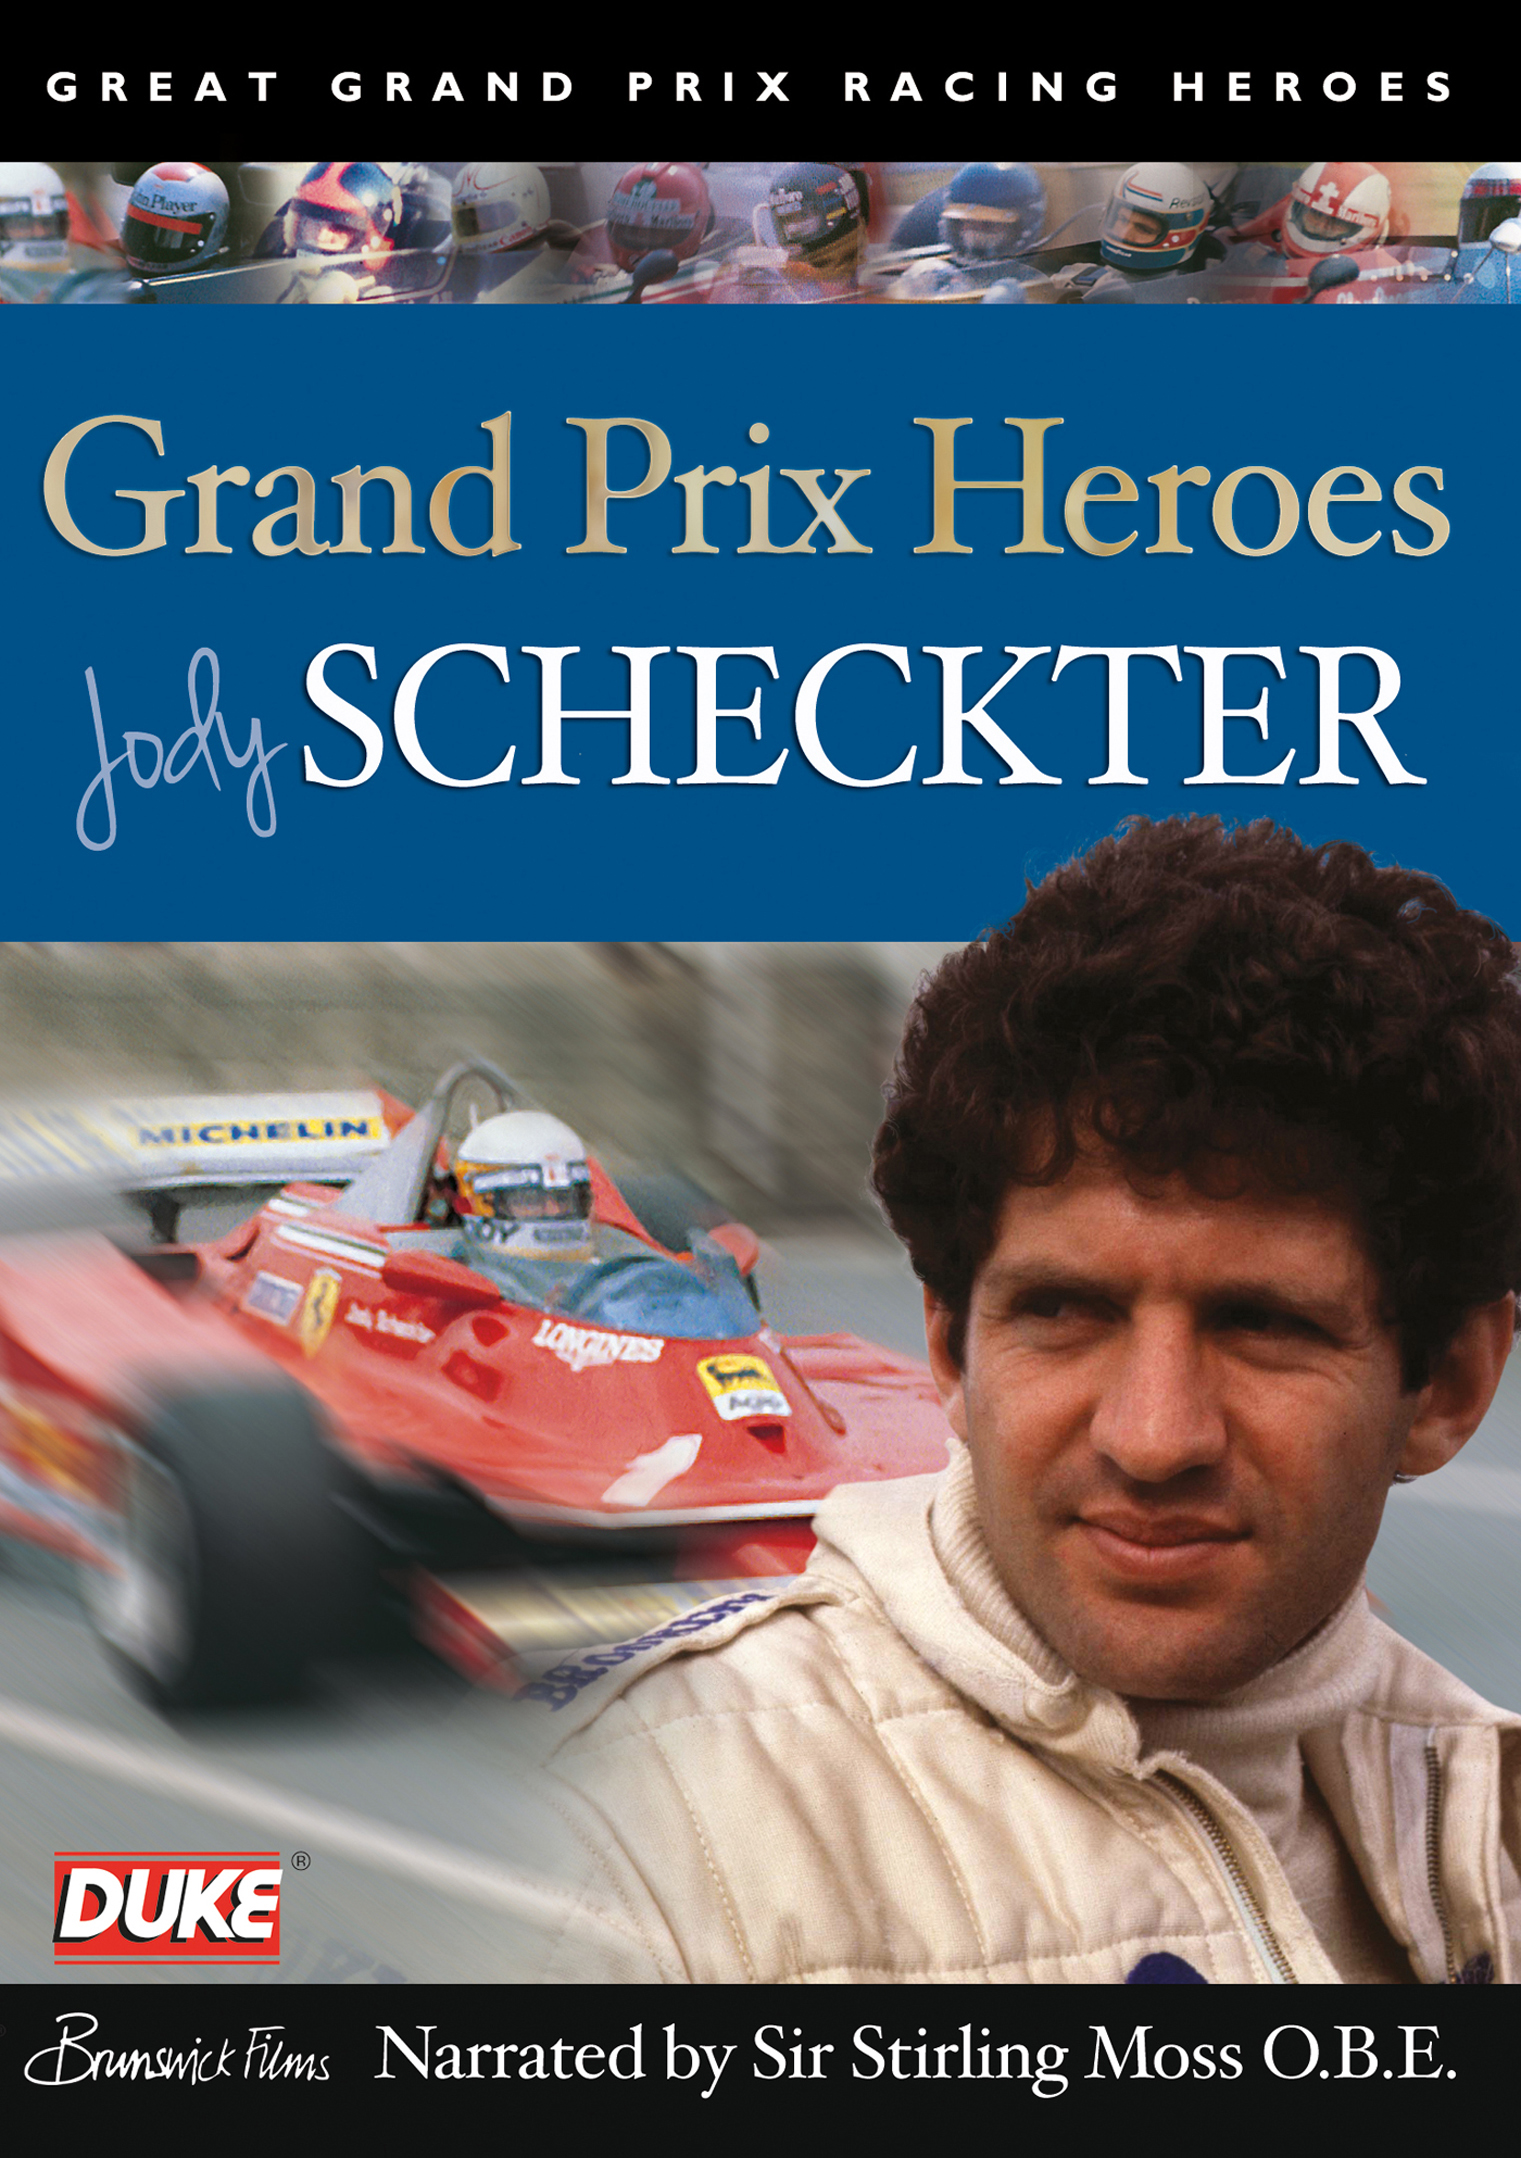 Grand Prix Heroes: Jody Scheckter